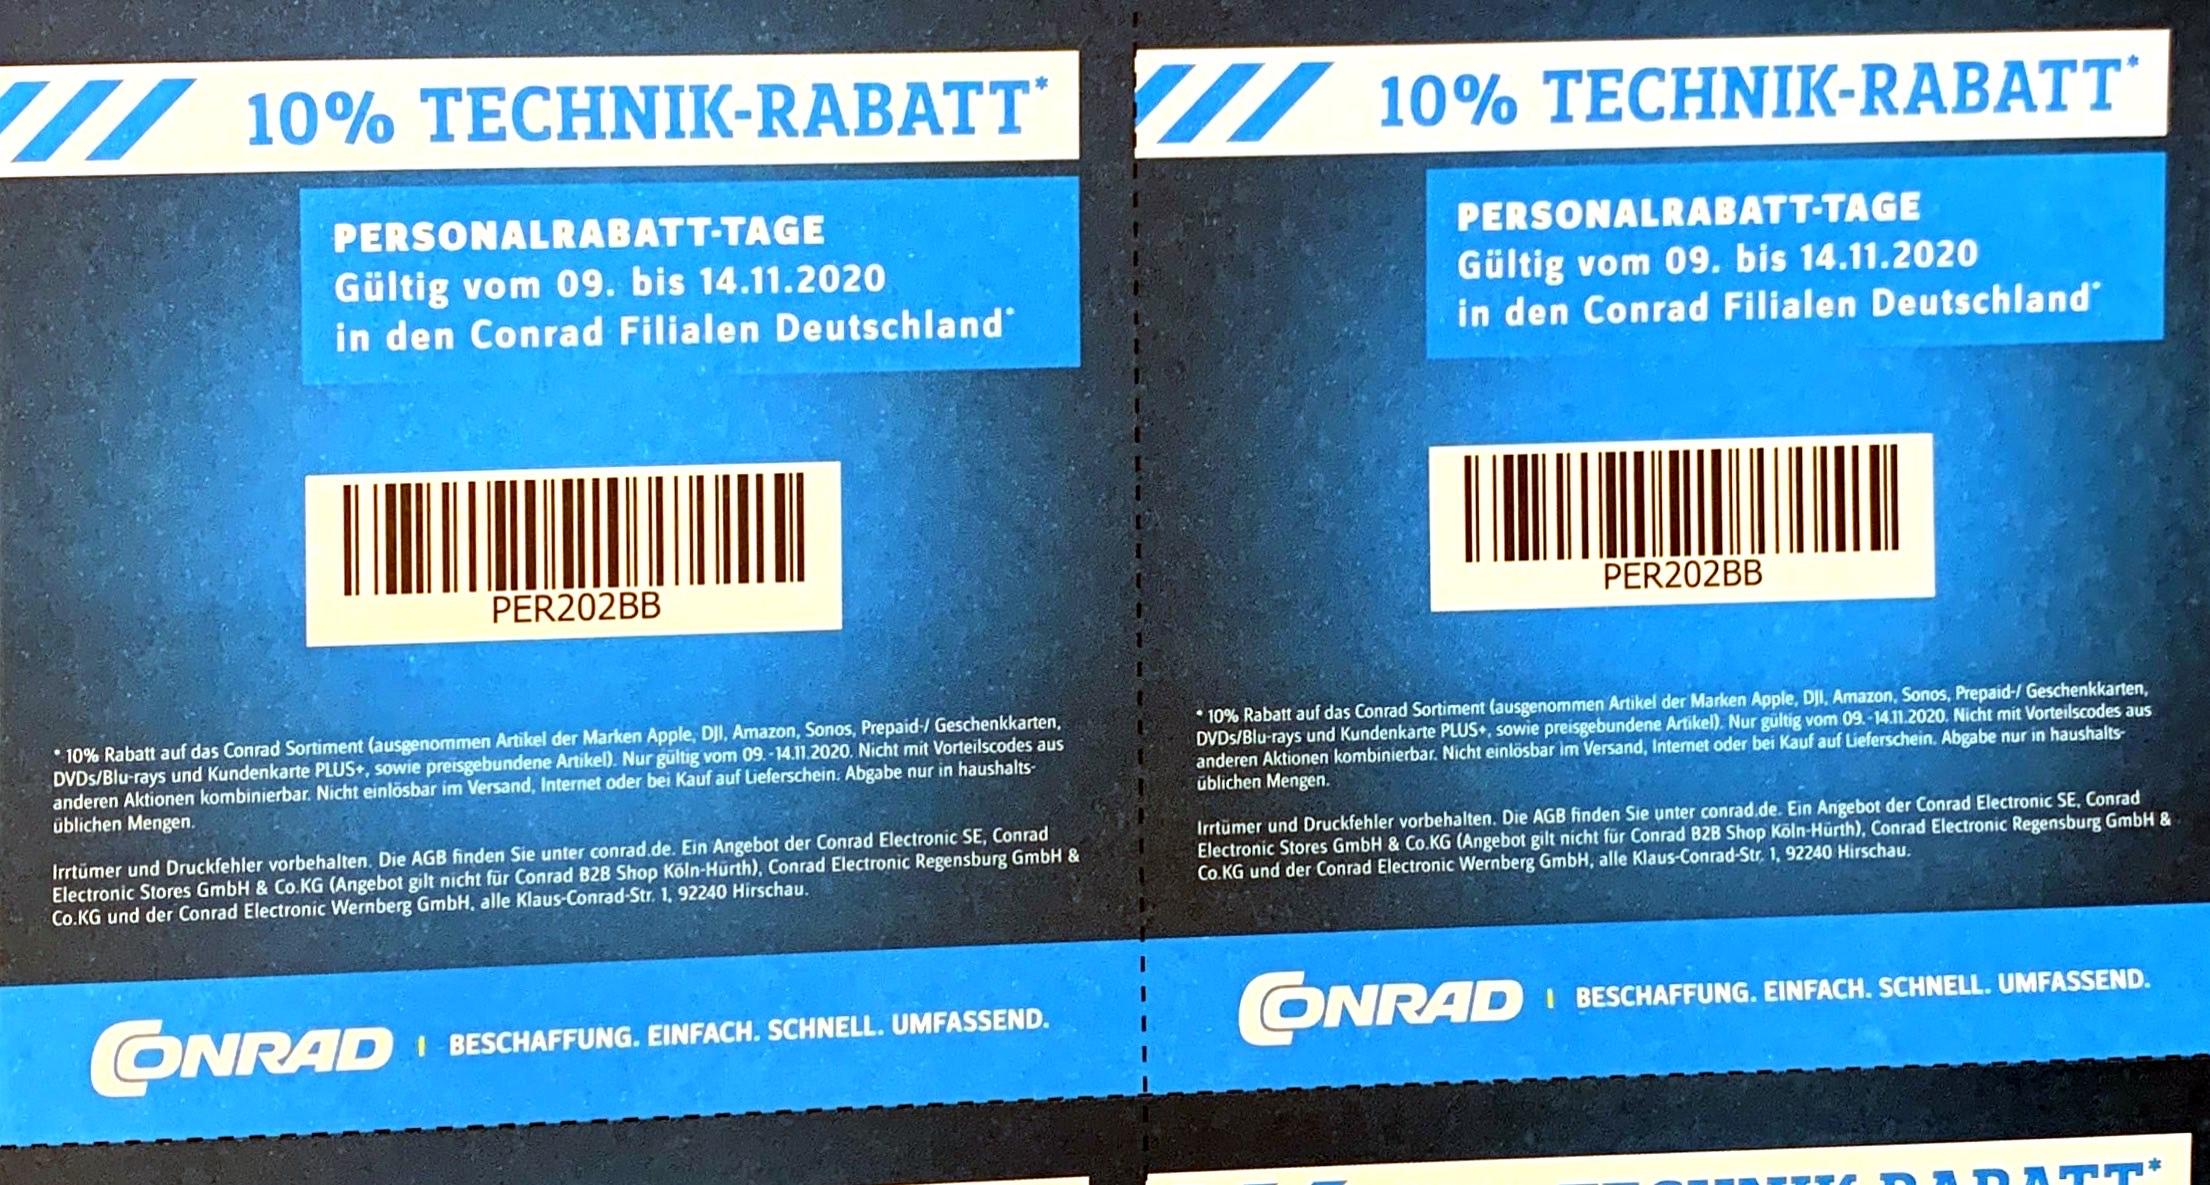 CONRAD: 10% Technik-Rabatt (Personalrabatt-Tage)